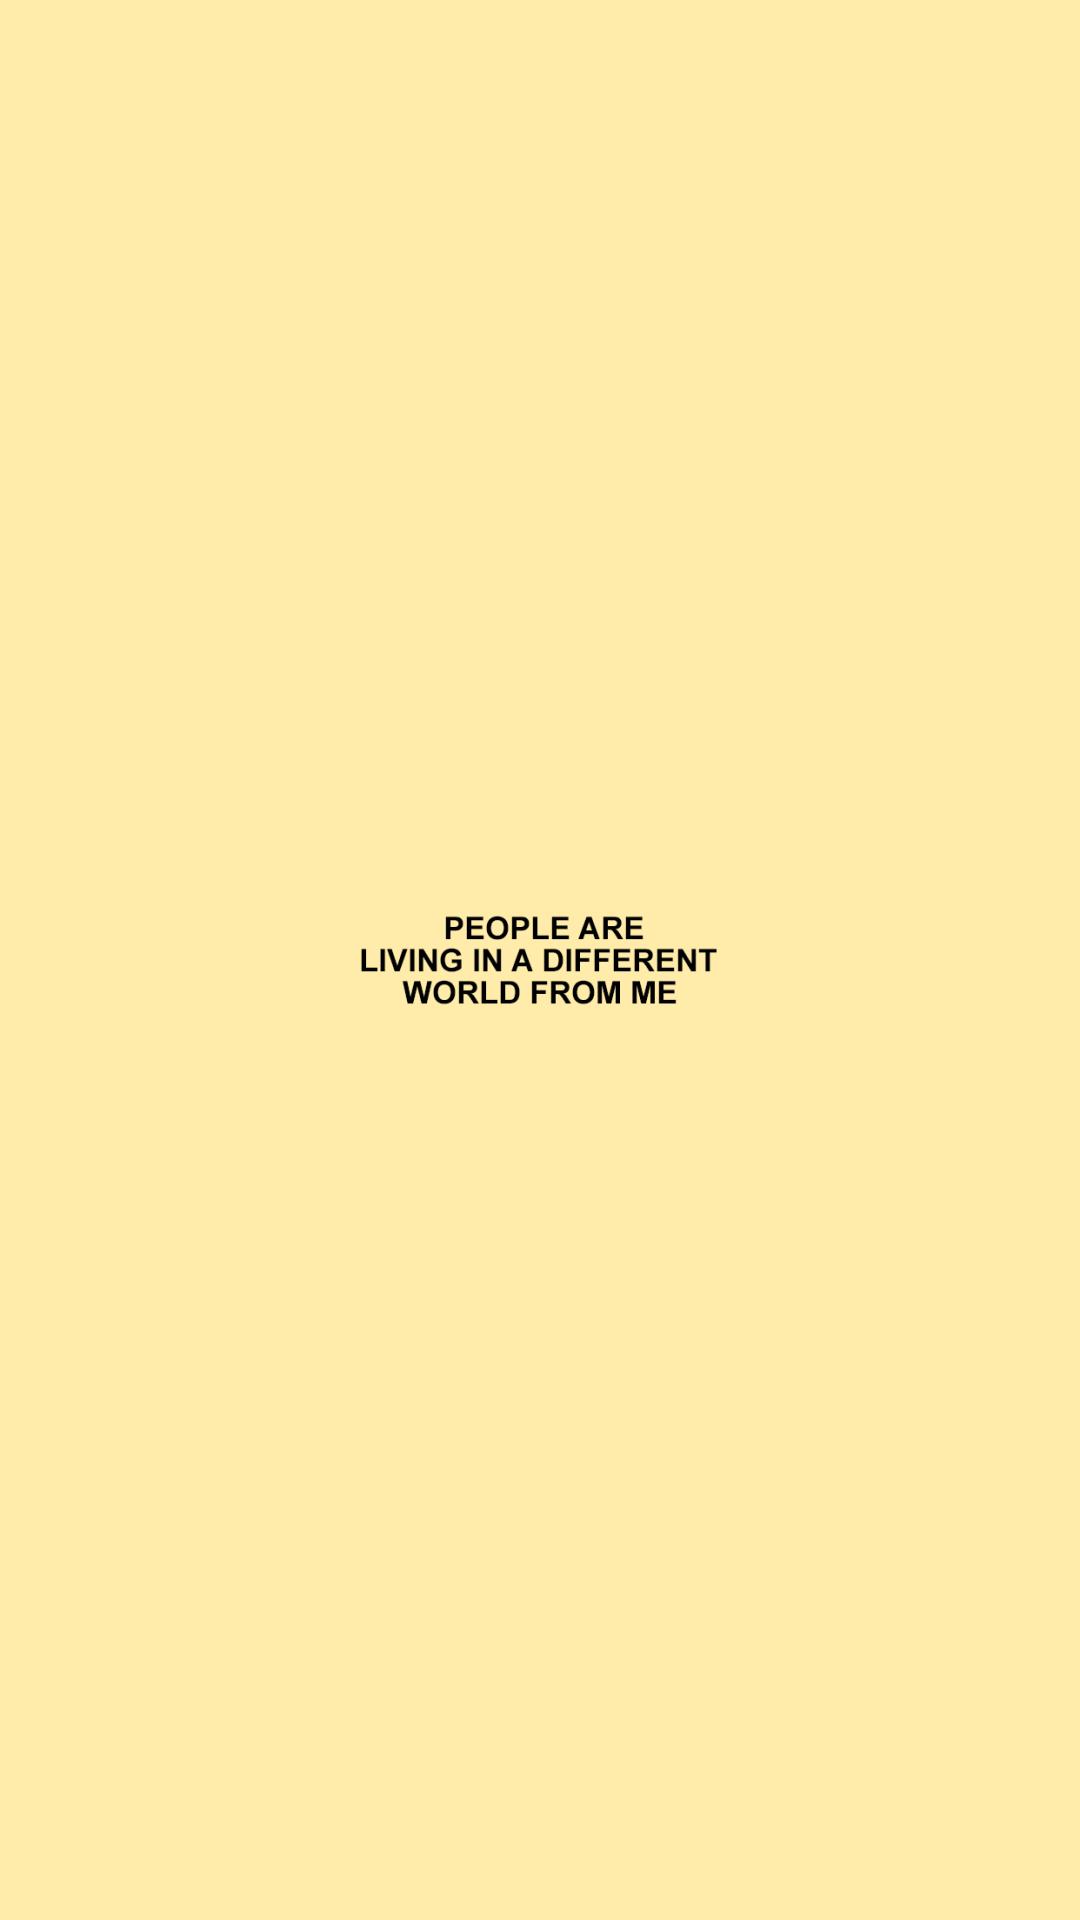 Landscape Yellow Aesthetic Landscape Yellow In 2020 Aesthetic Desktop Wallpaper Quote Aesthetic Yellow Aesthetic